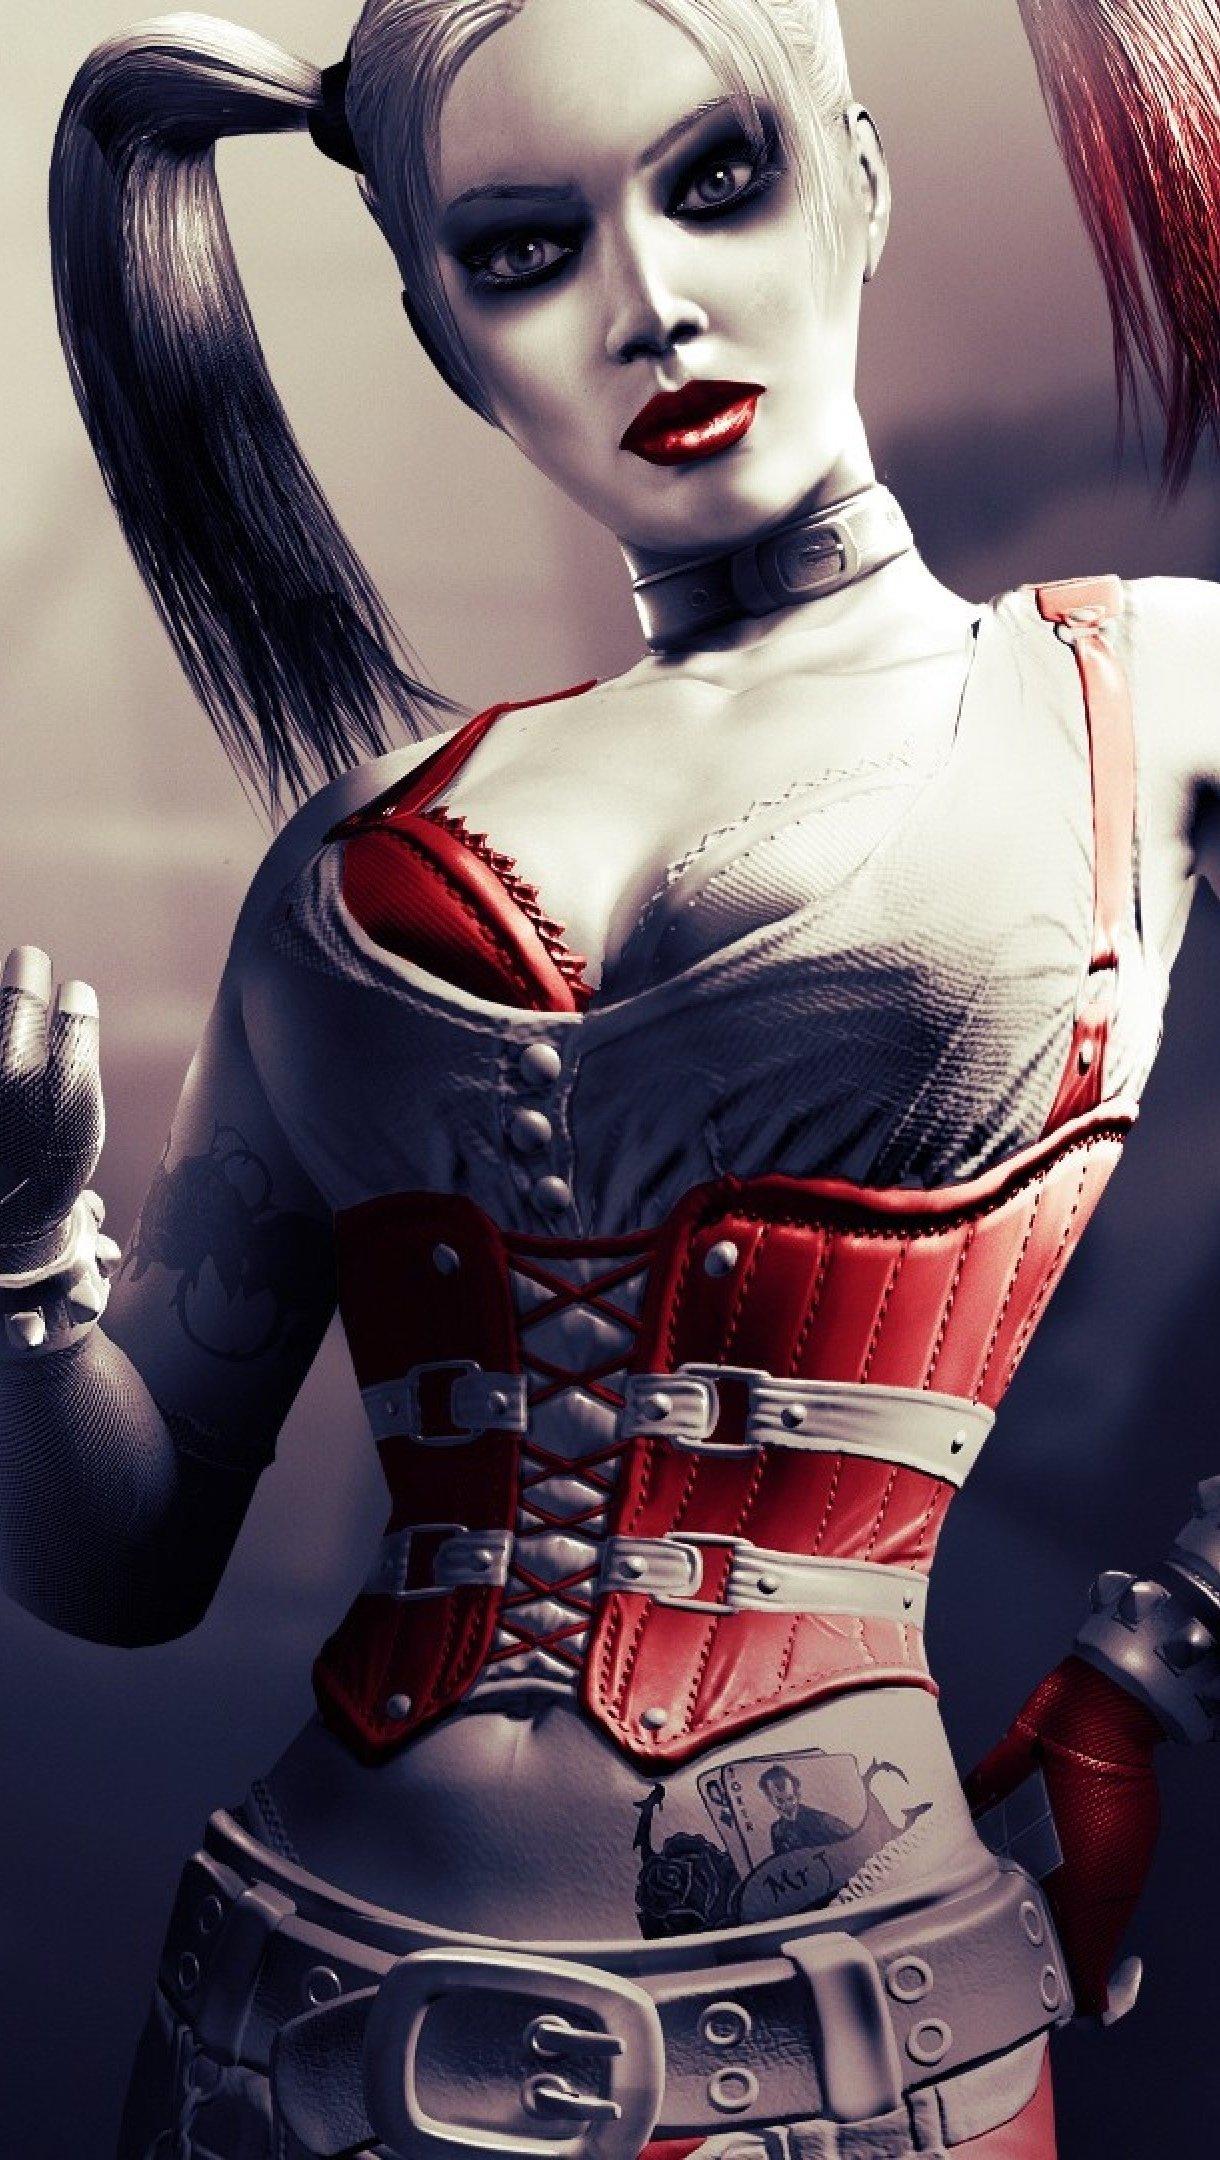 Fondos de pantalla Harley Quinn Batman Arkham City Vertical